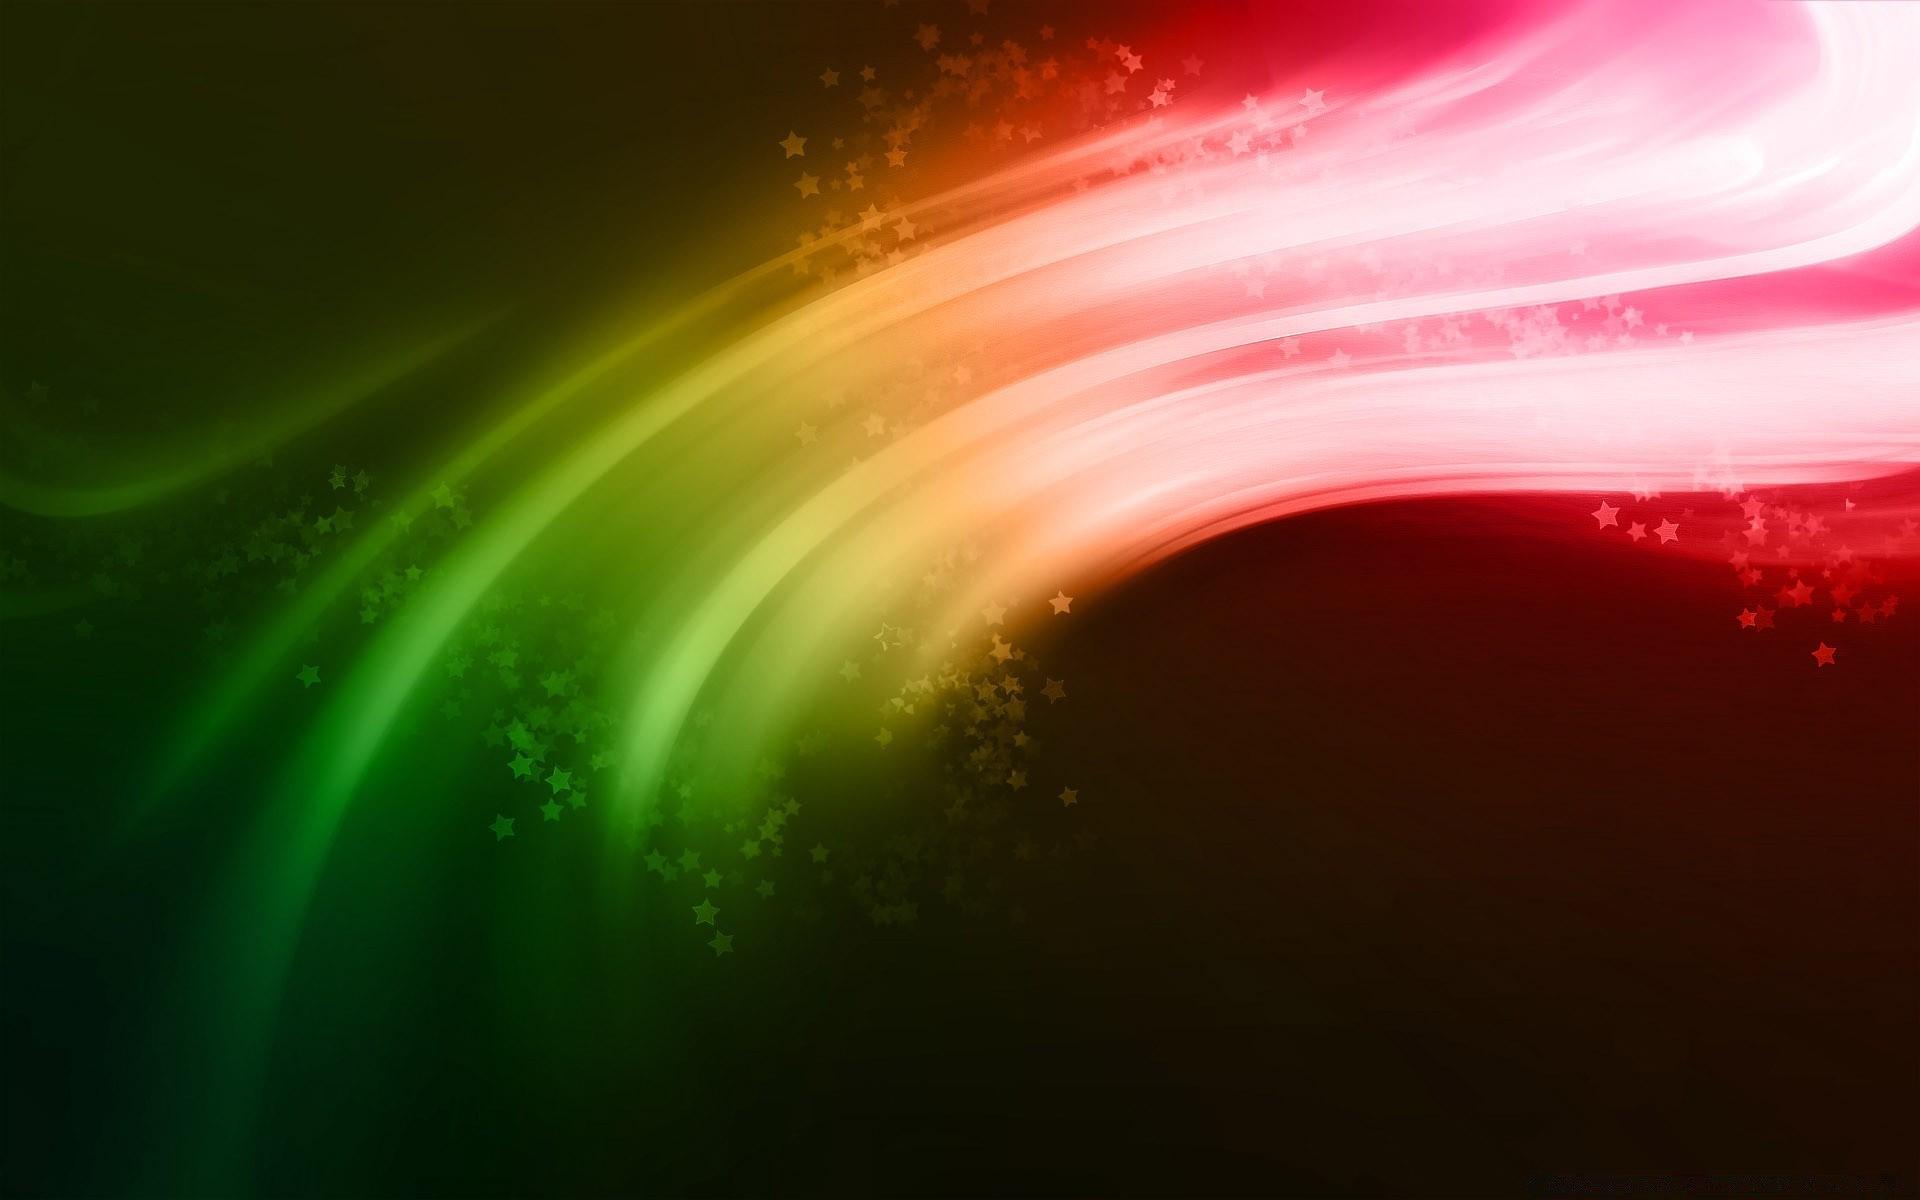 dynamic desktop background